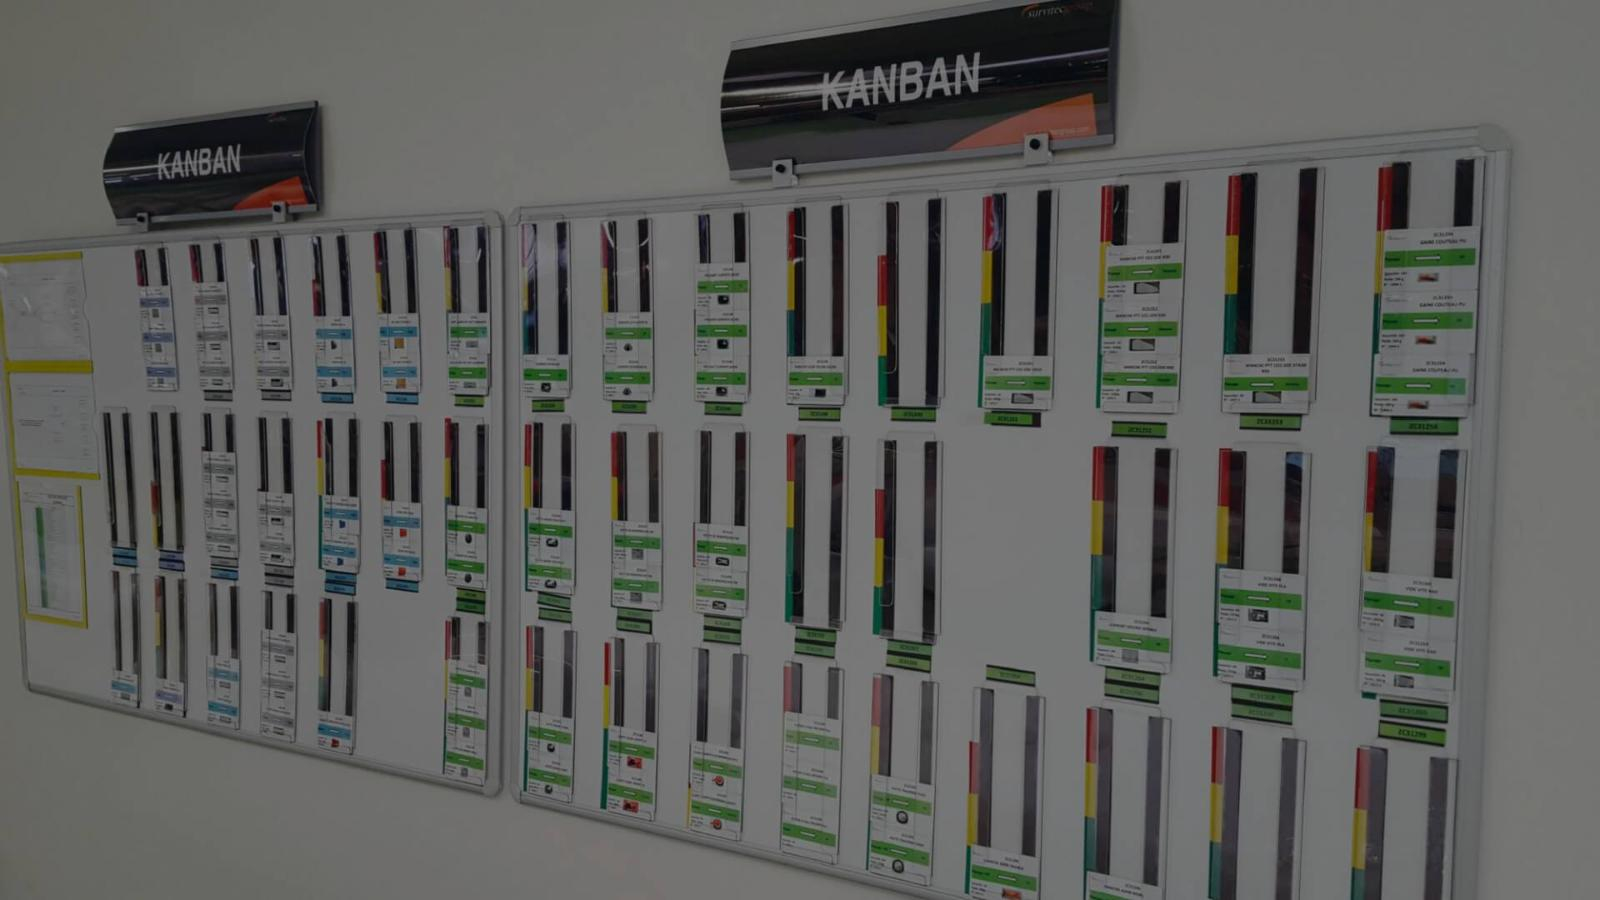 Whiteboard with Kanban card